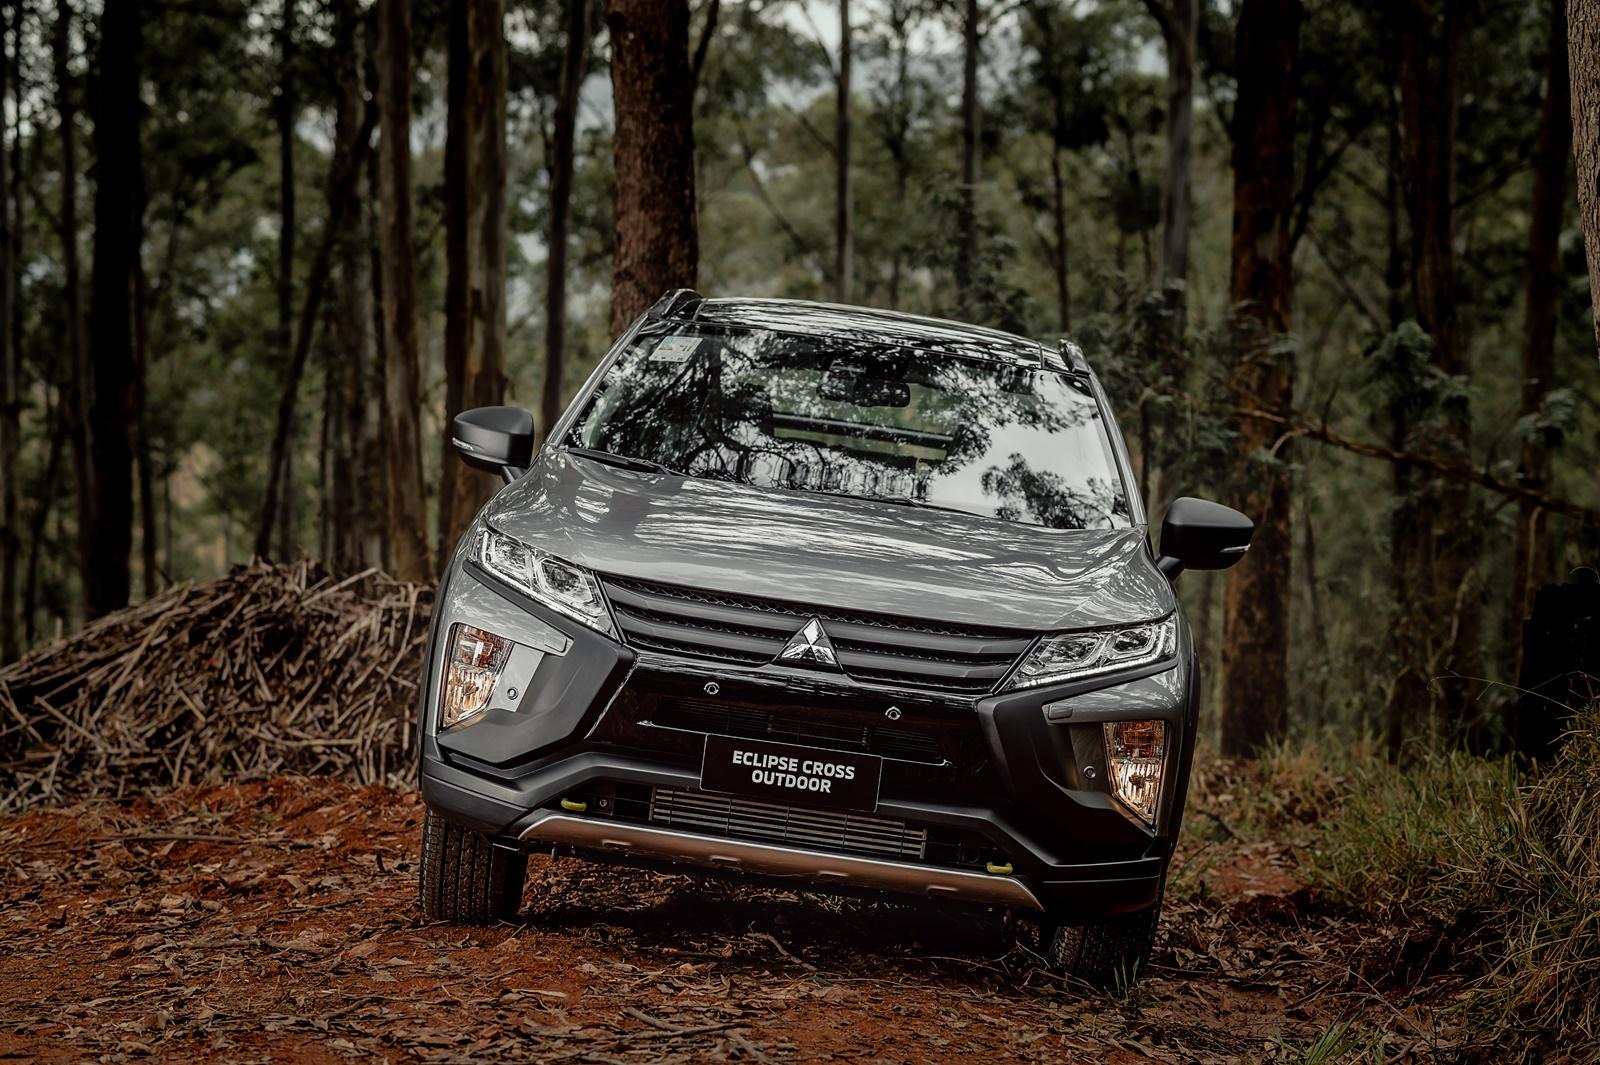 Mitsubishi Eclipse Cross Outdoor 10